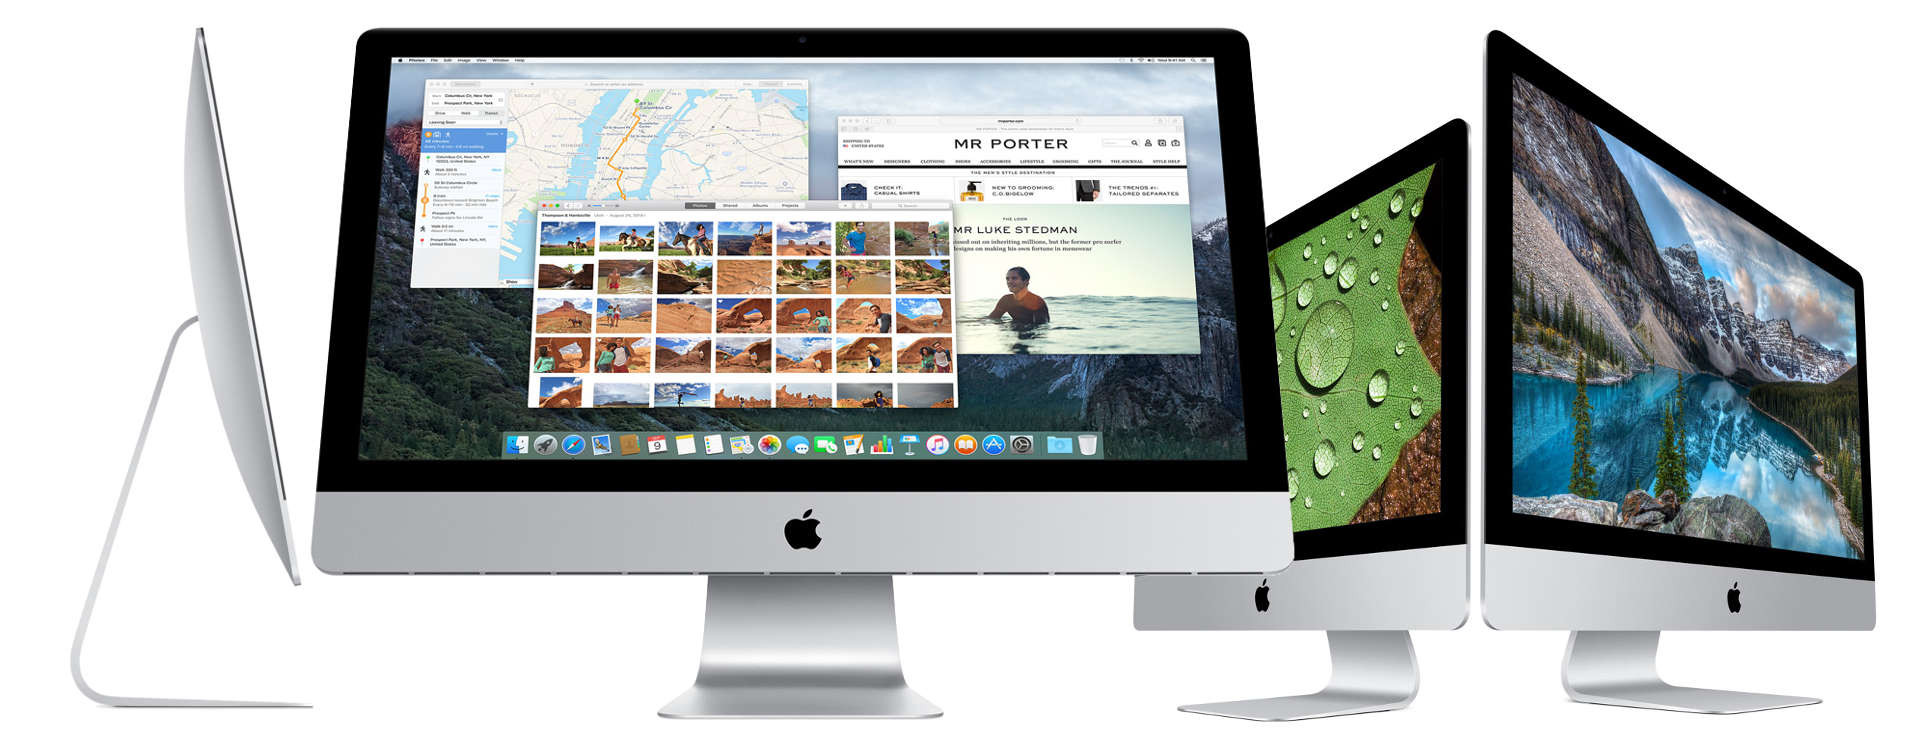 Used and Refurbished Retina iMac Buyers Guide